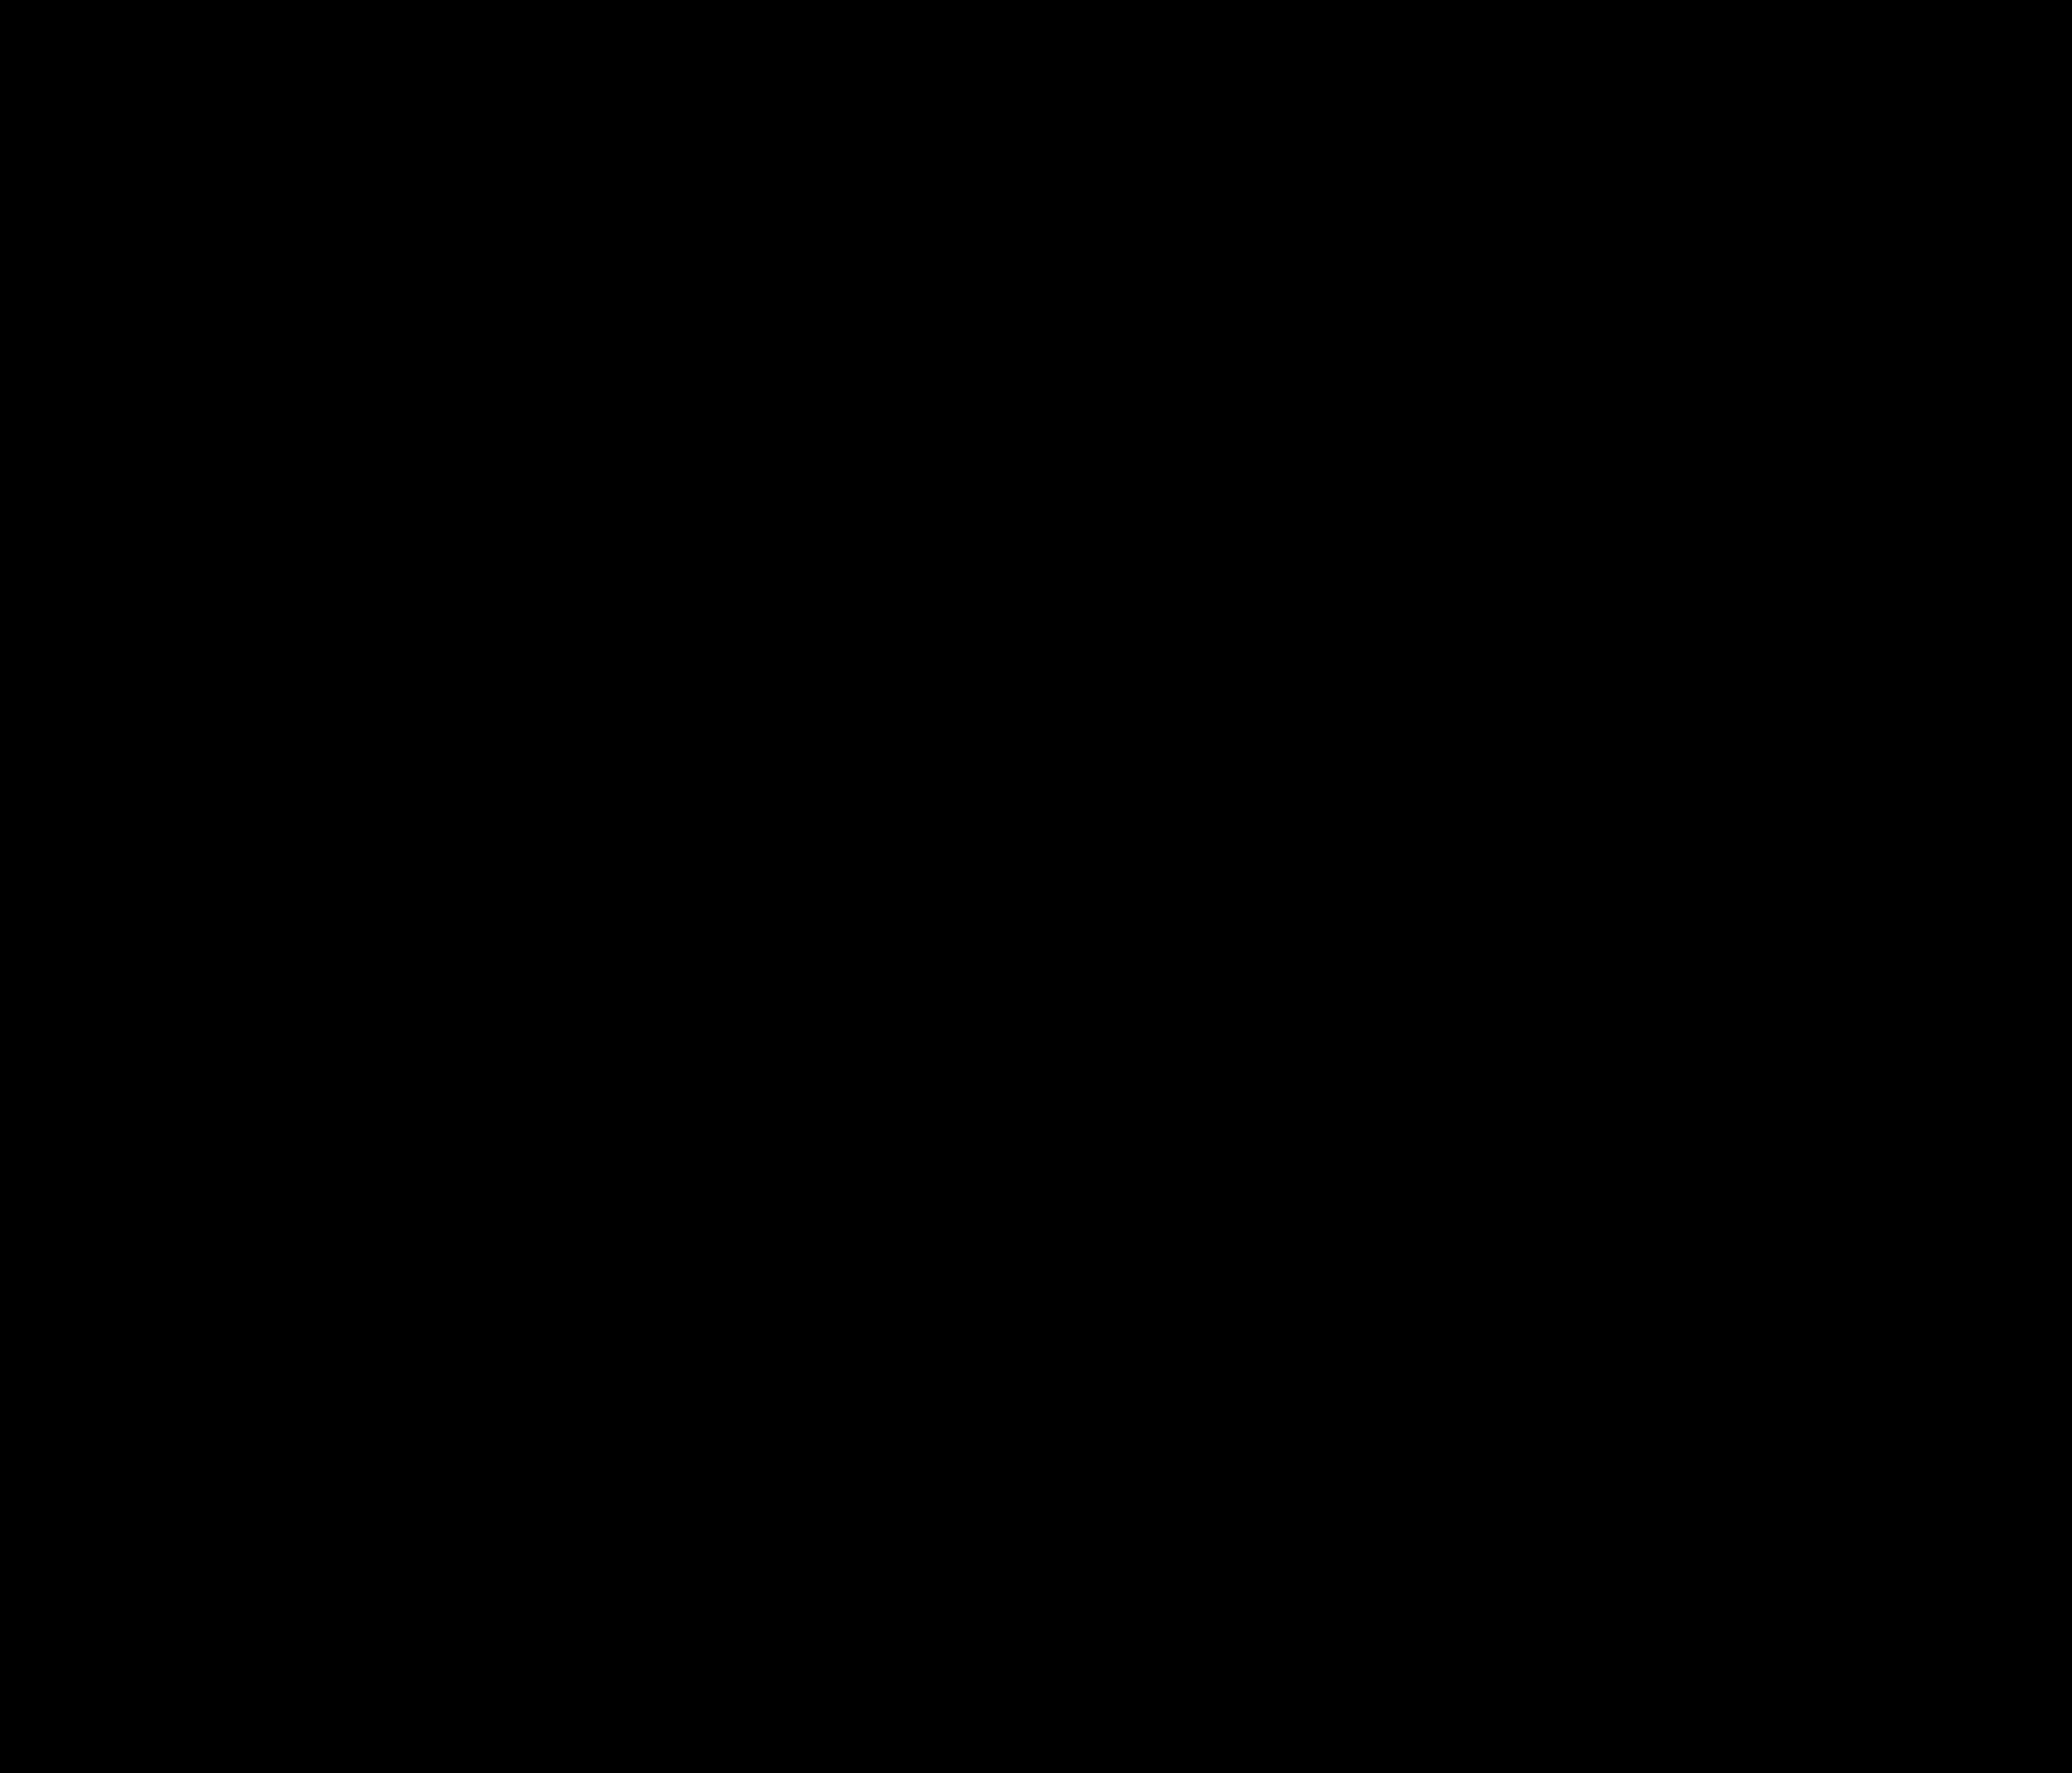 2189x1873 Clipart